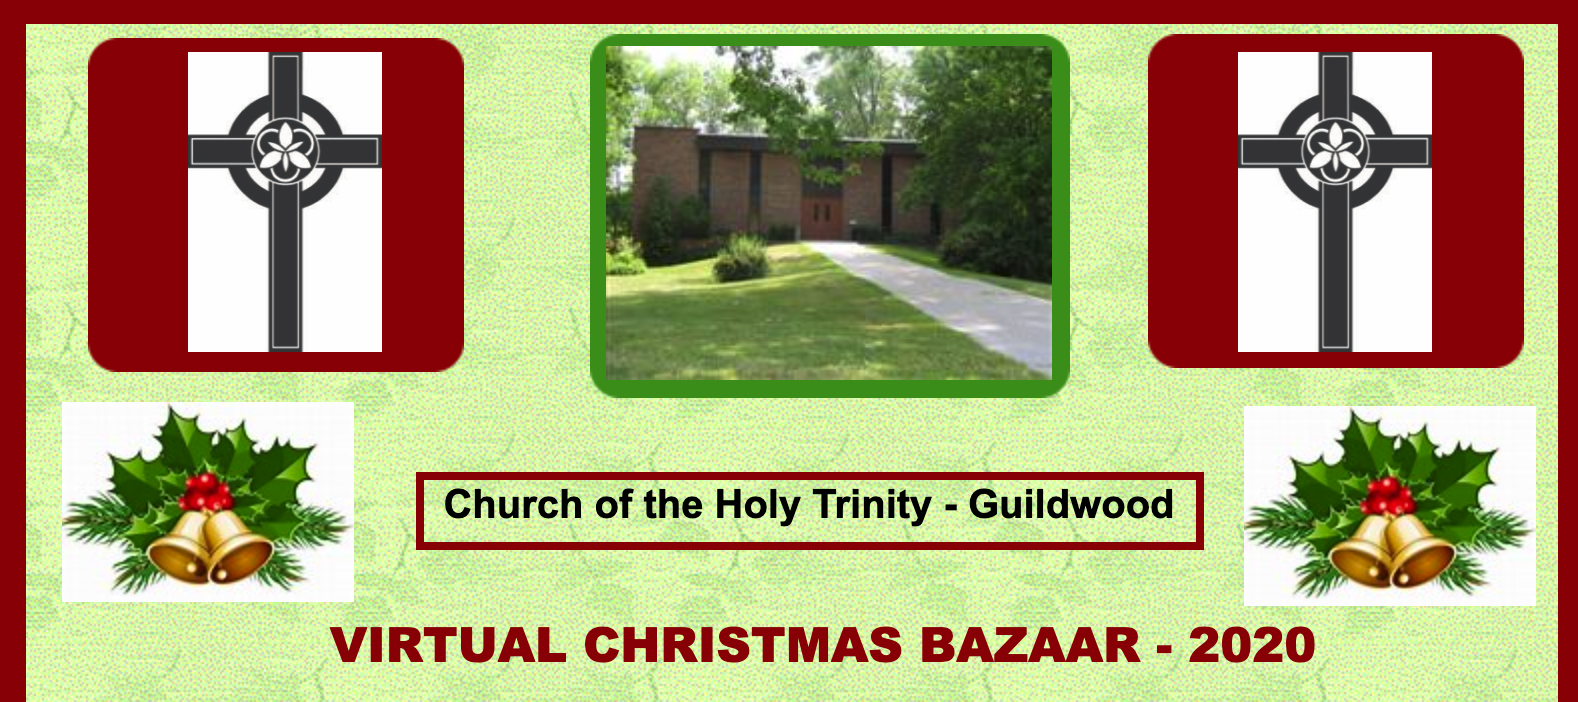 Virtual Christmas Bazaar banner